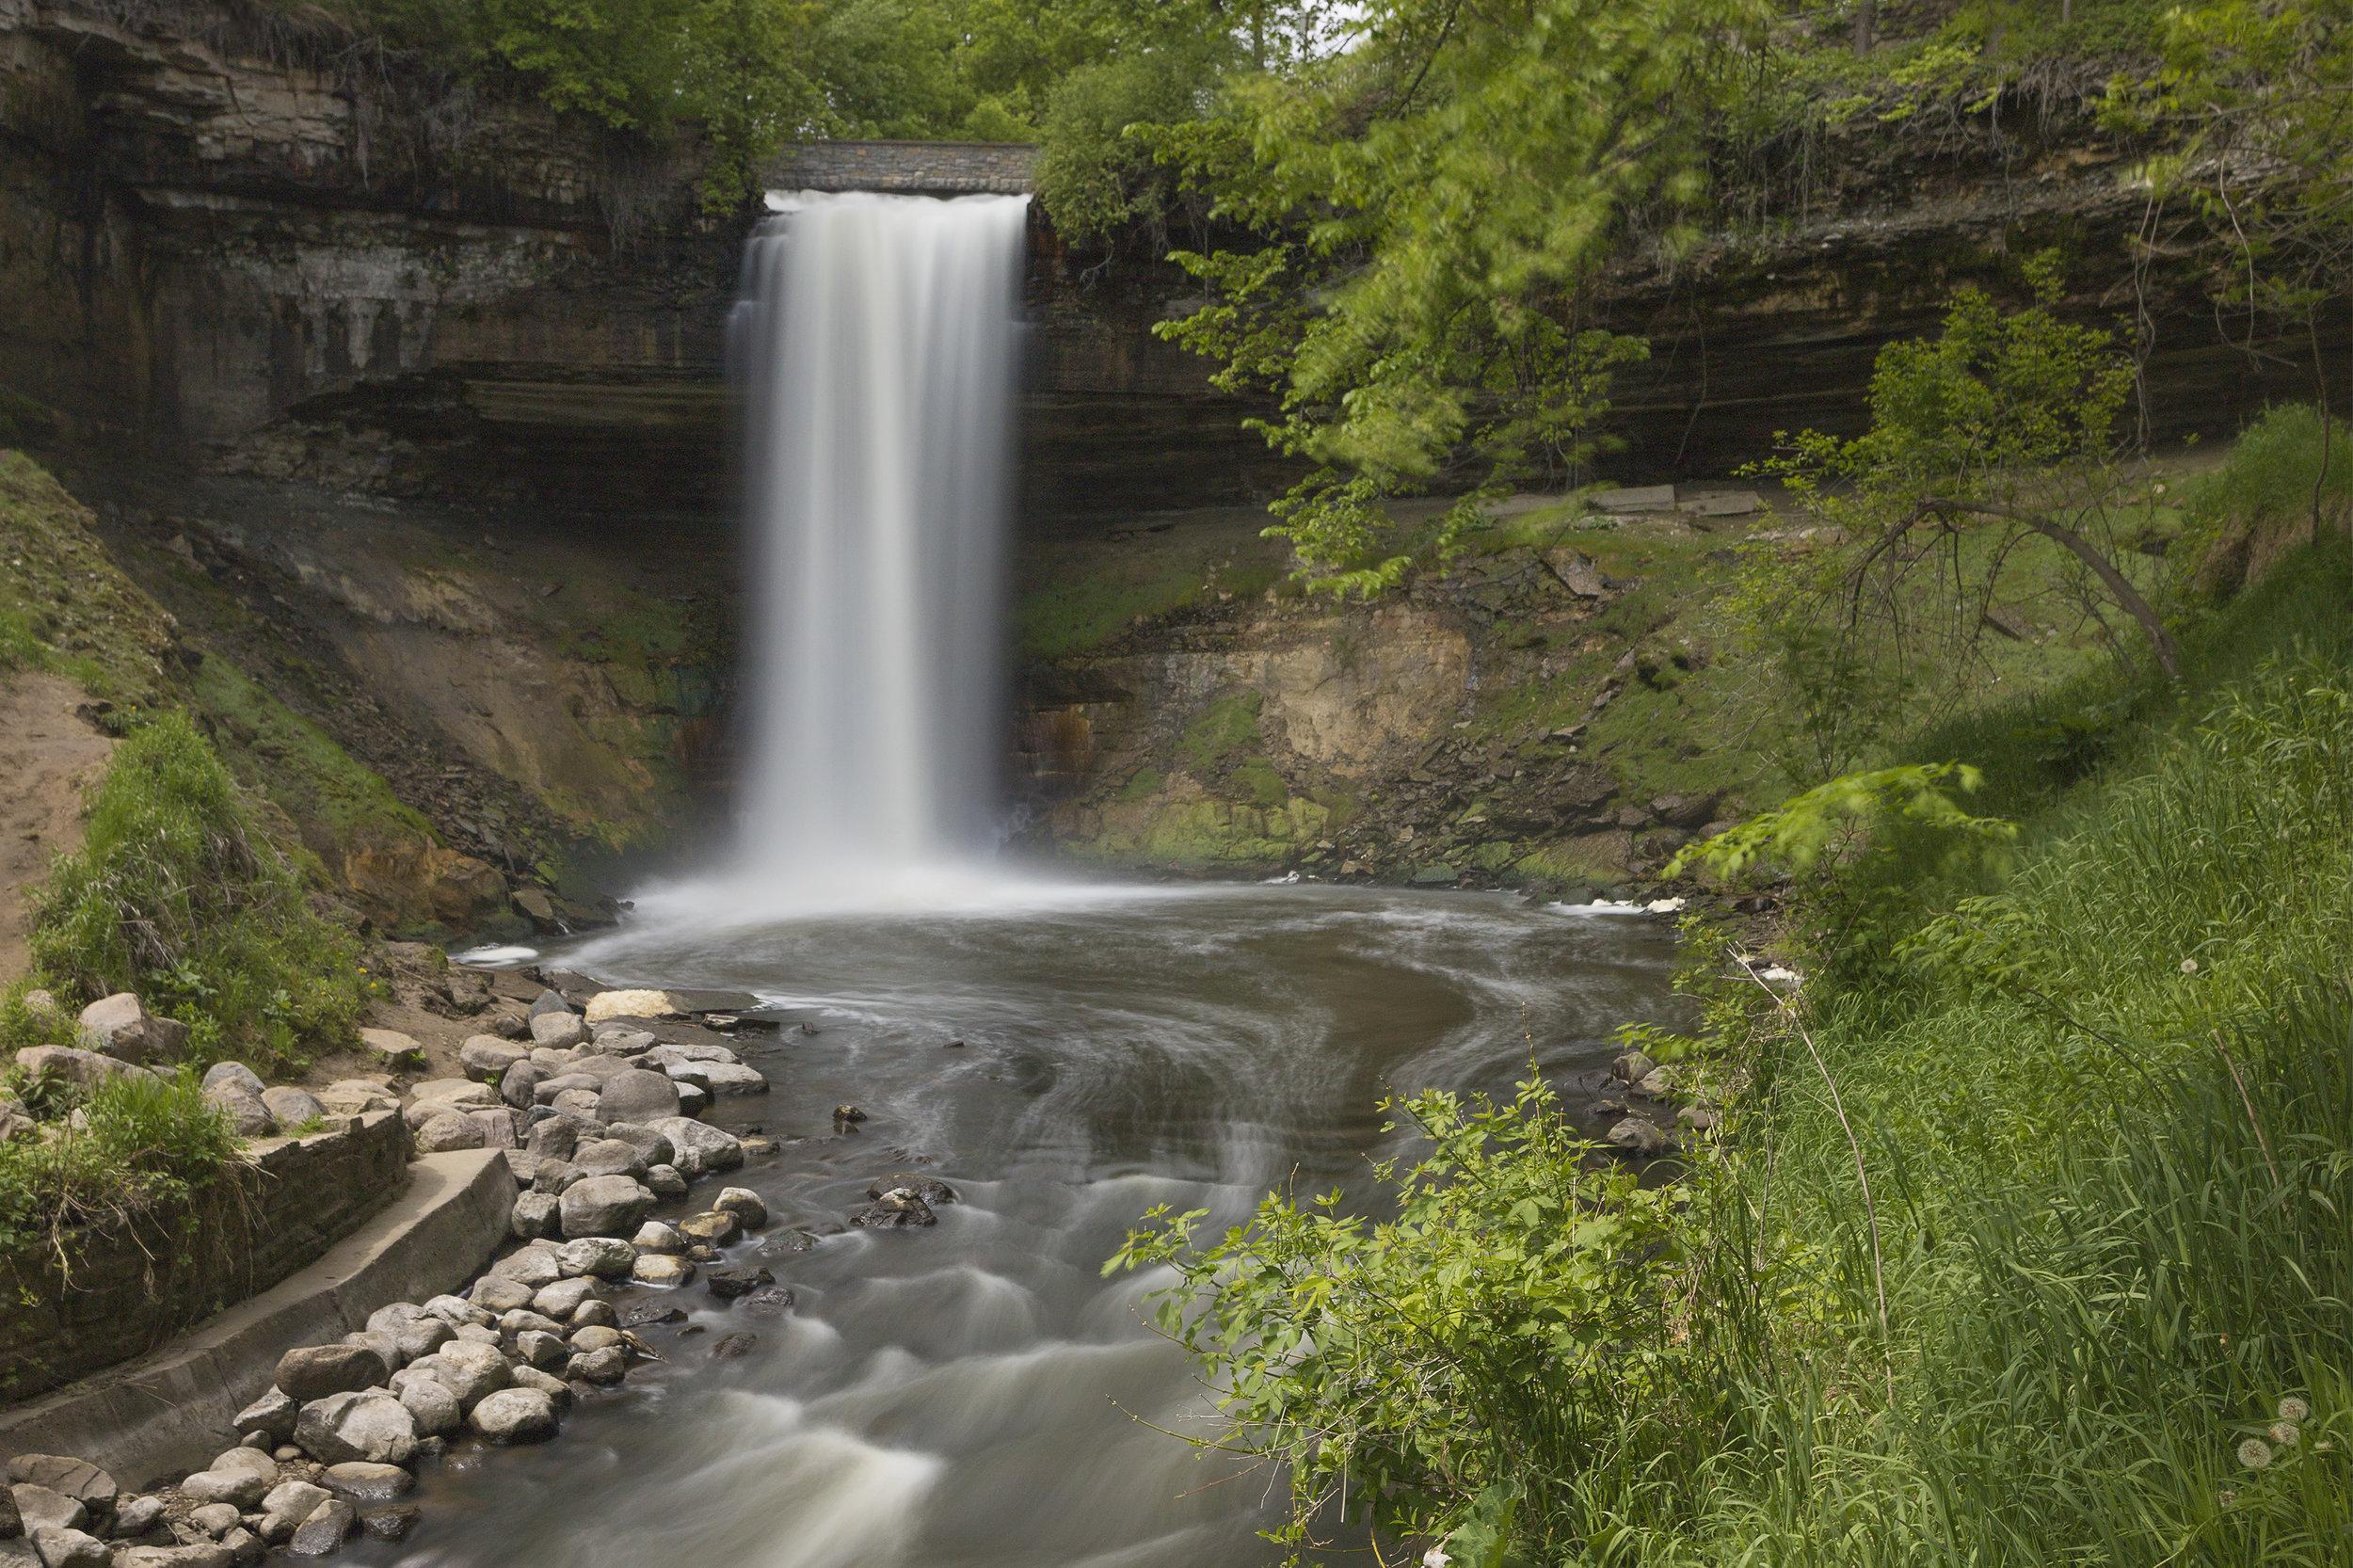 minnehaha falls - minneapolis